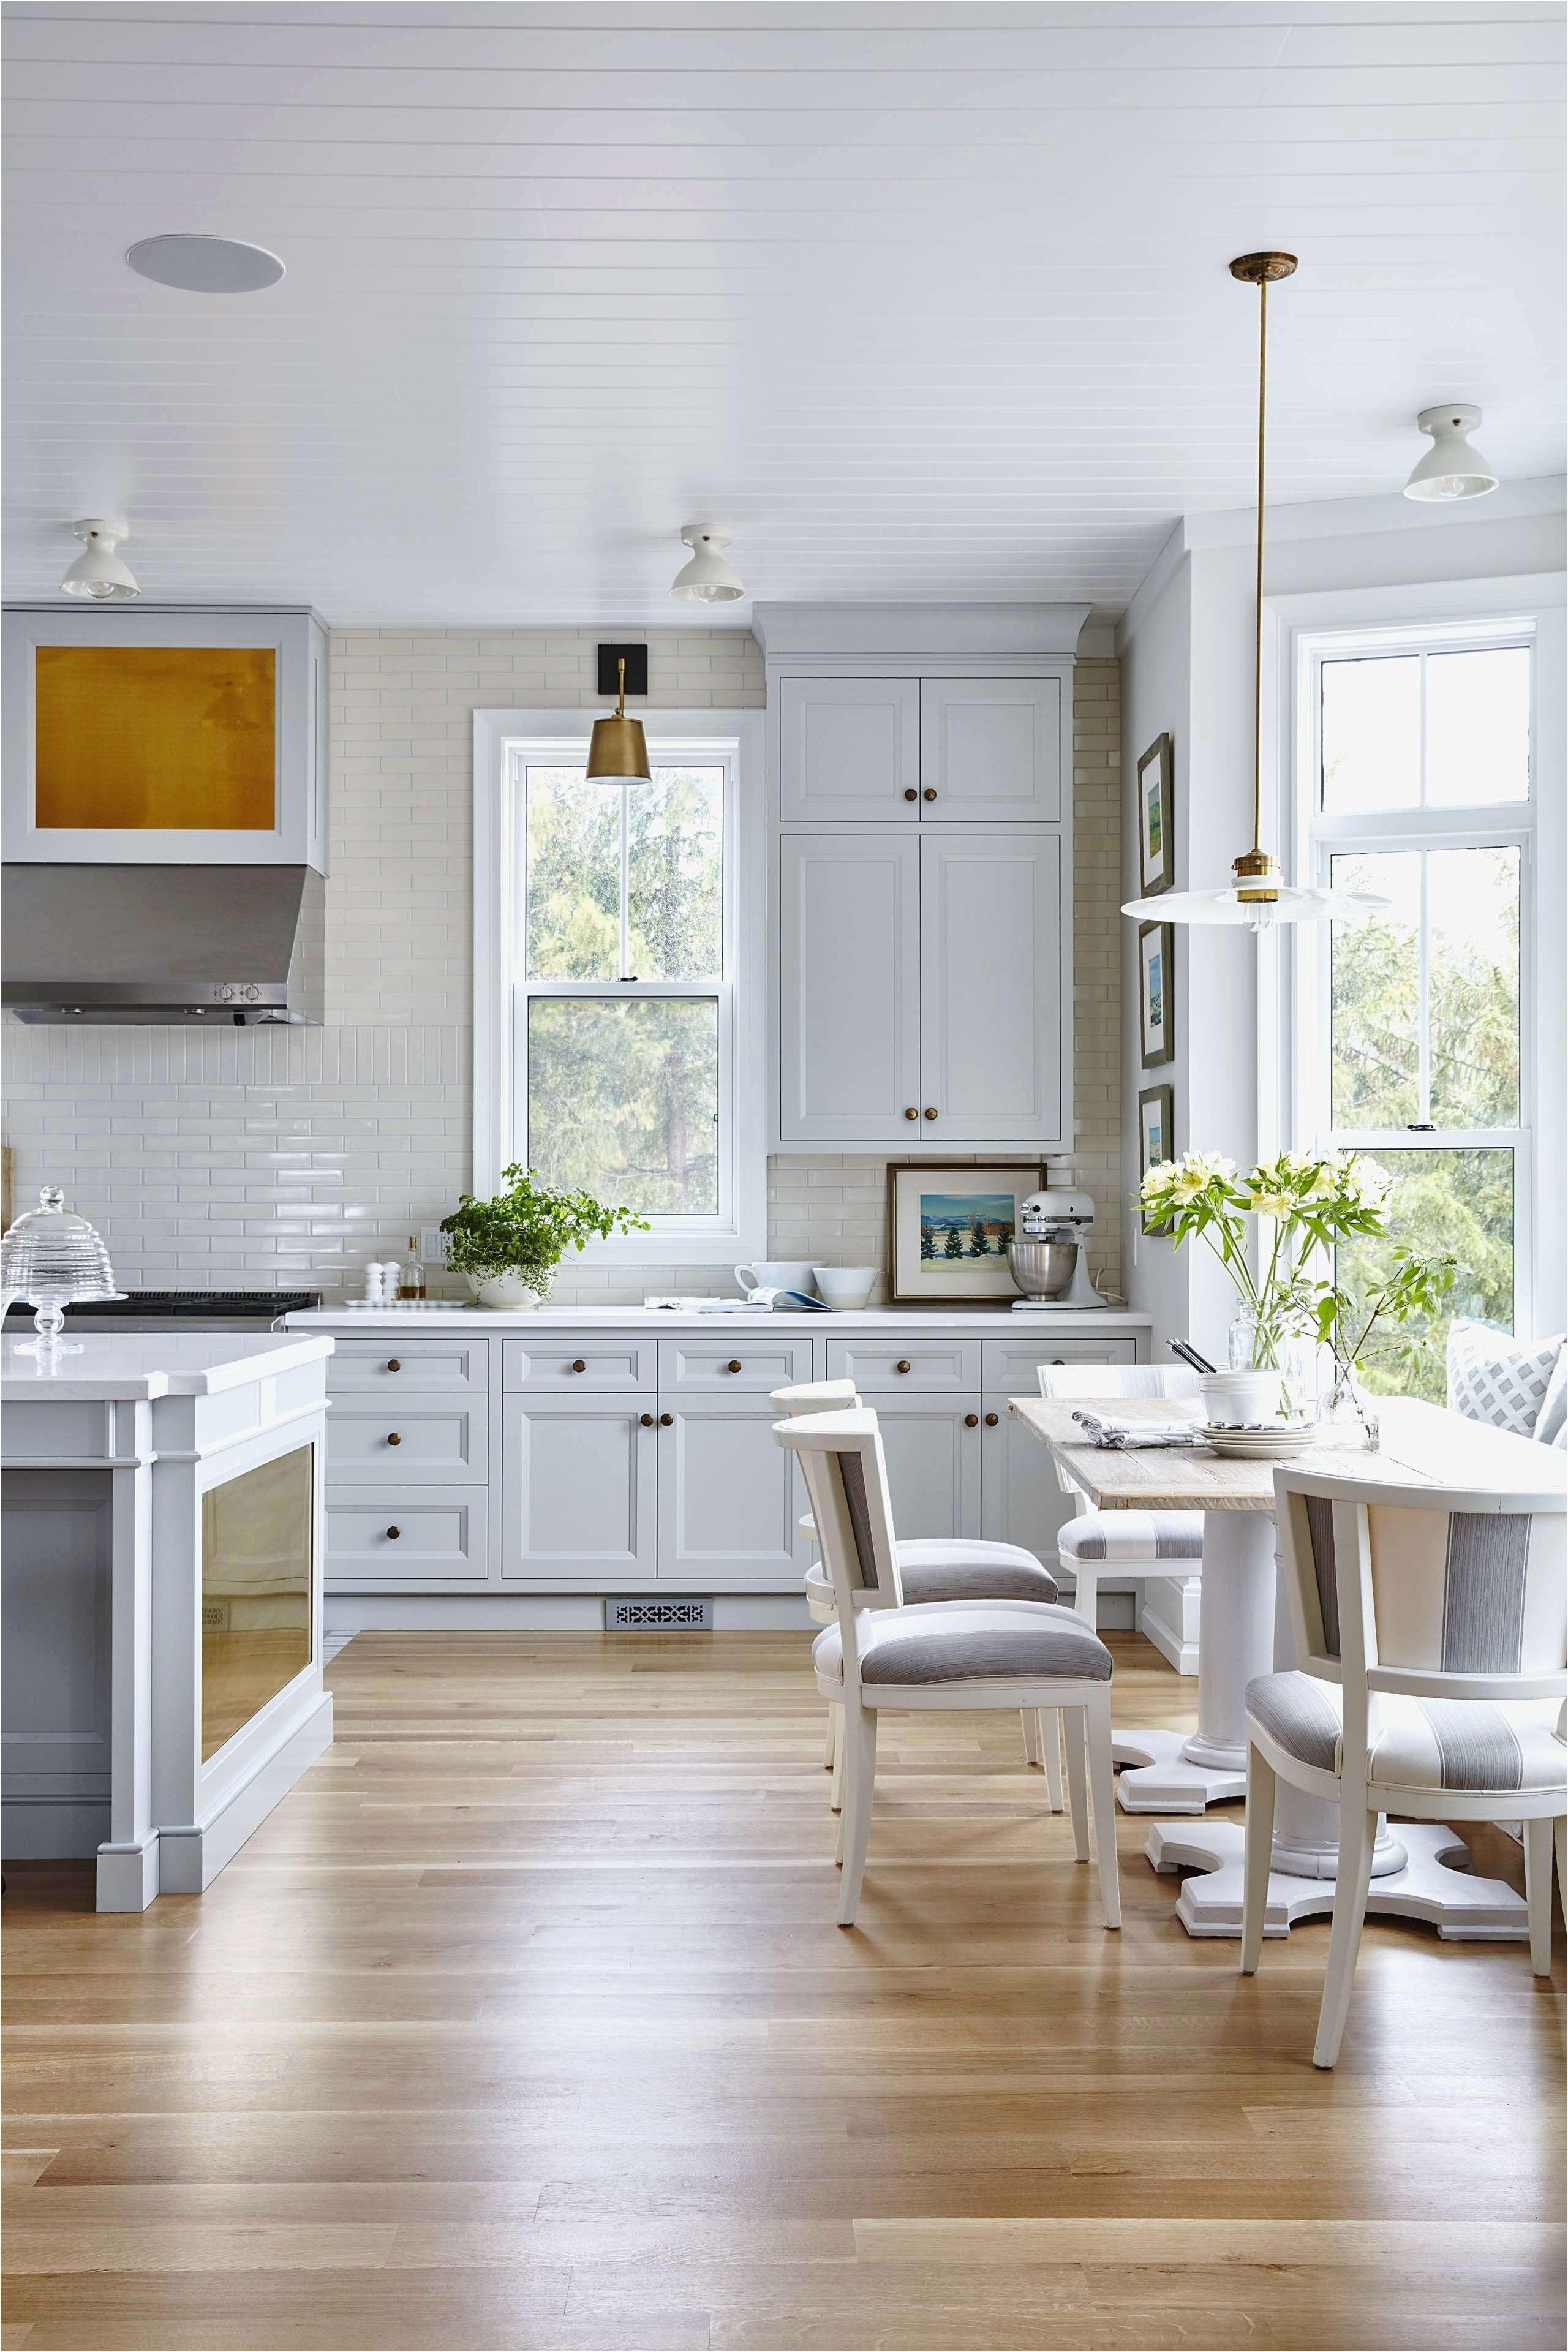 Kitchen Redesign Ideas Christmas Outdoor Decor Great Kitchen Joys